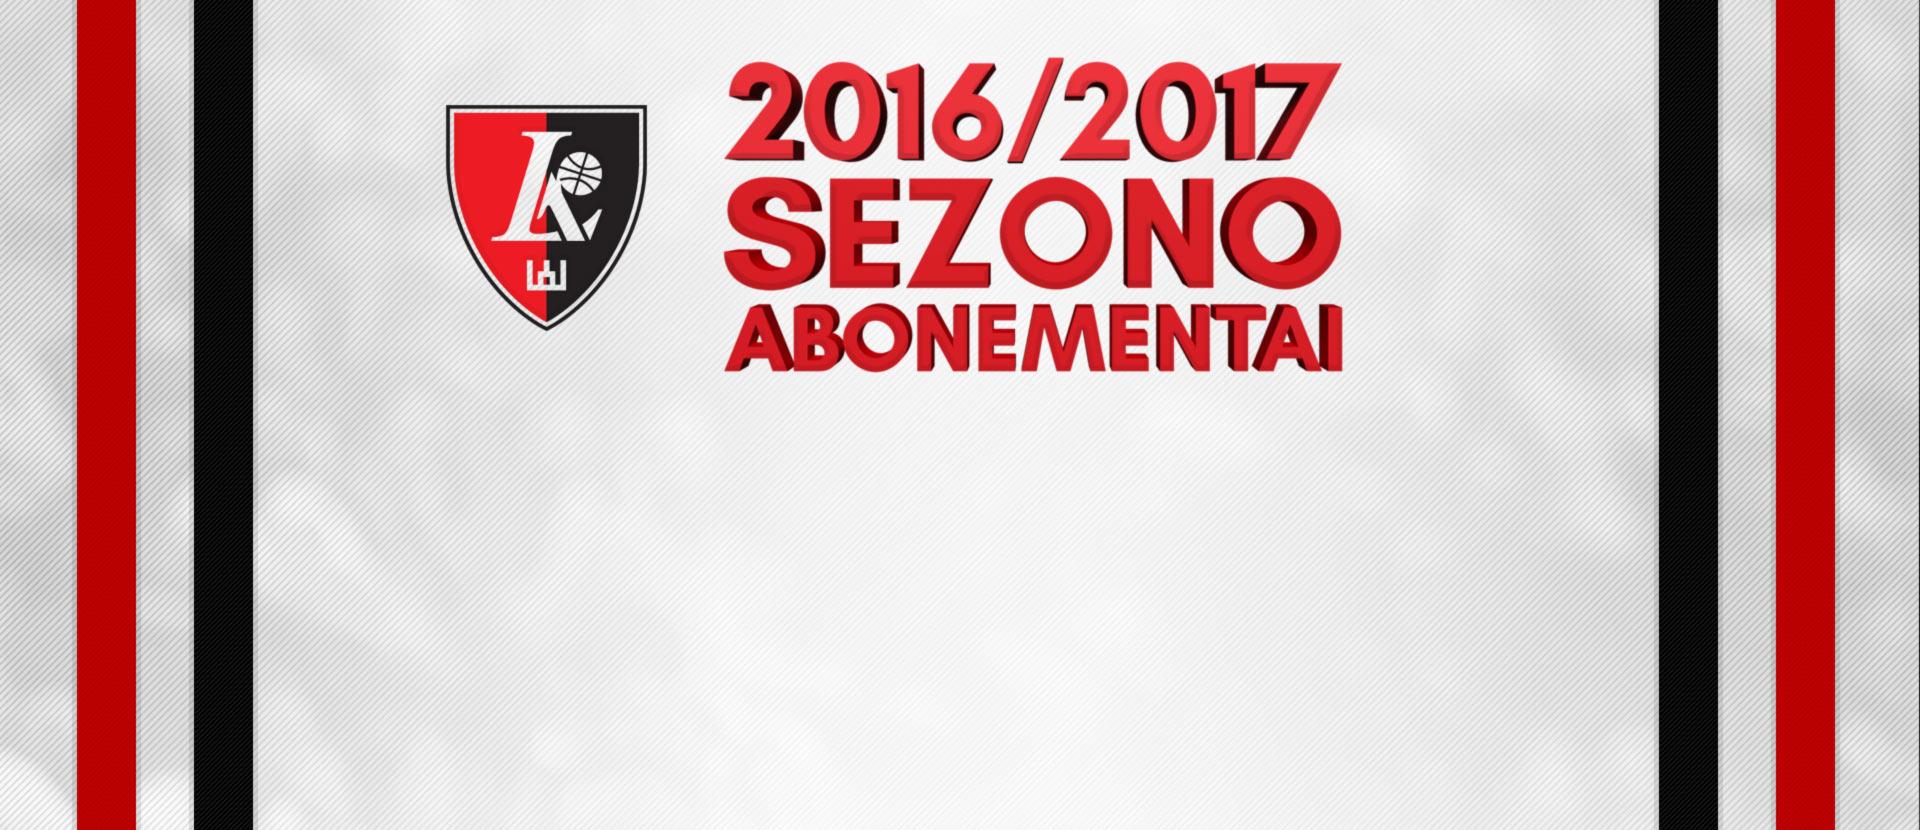 "Vilniaus ""Lietuvos ryto"" sezoniniai abonementai 2016 / 2017 m."